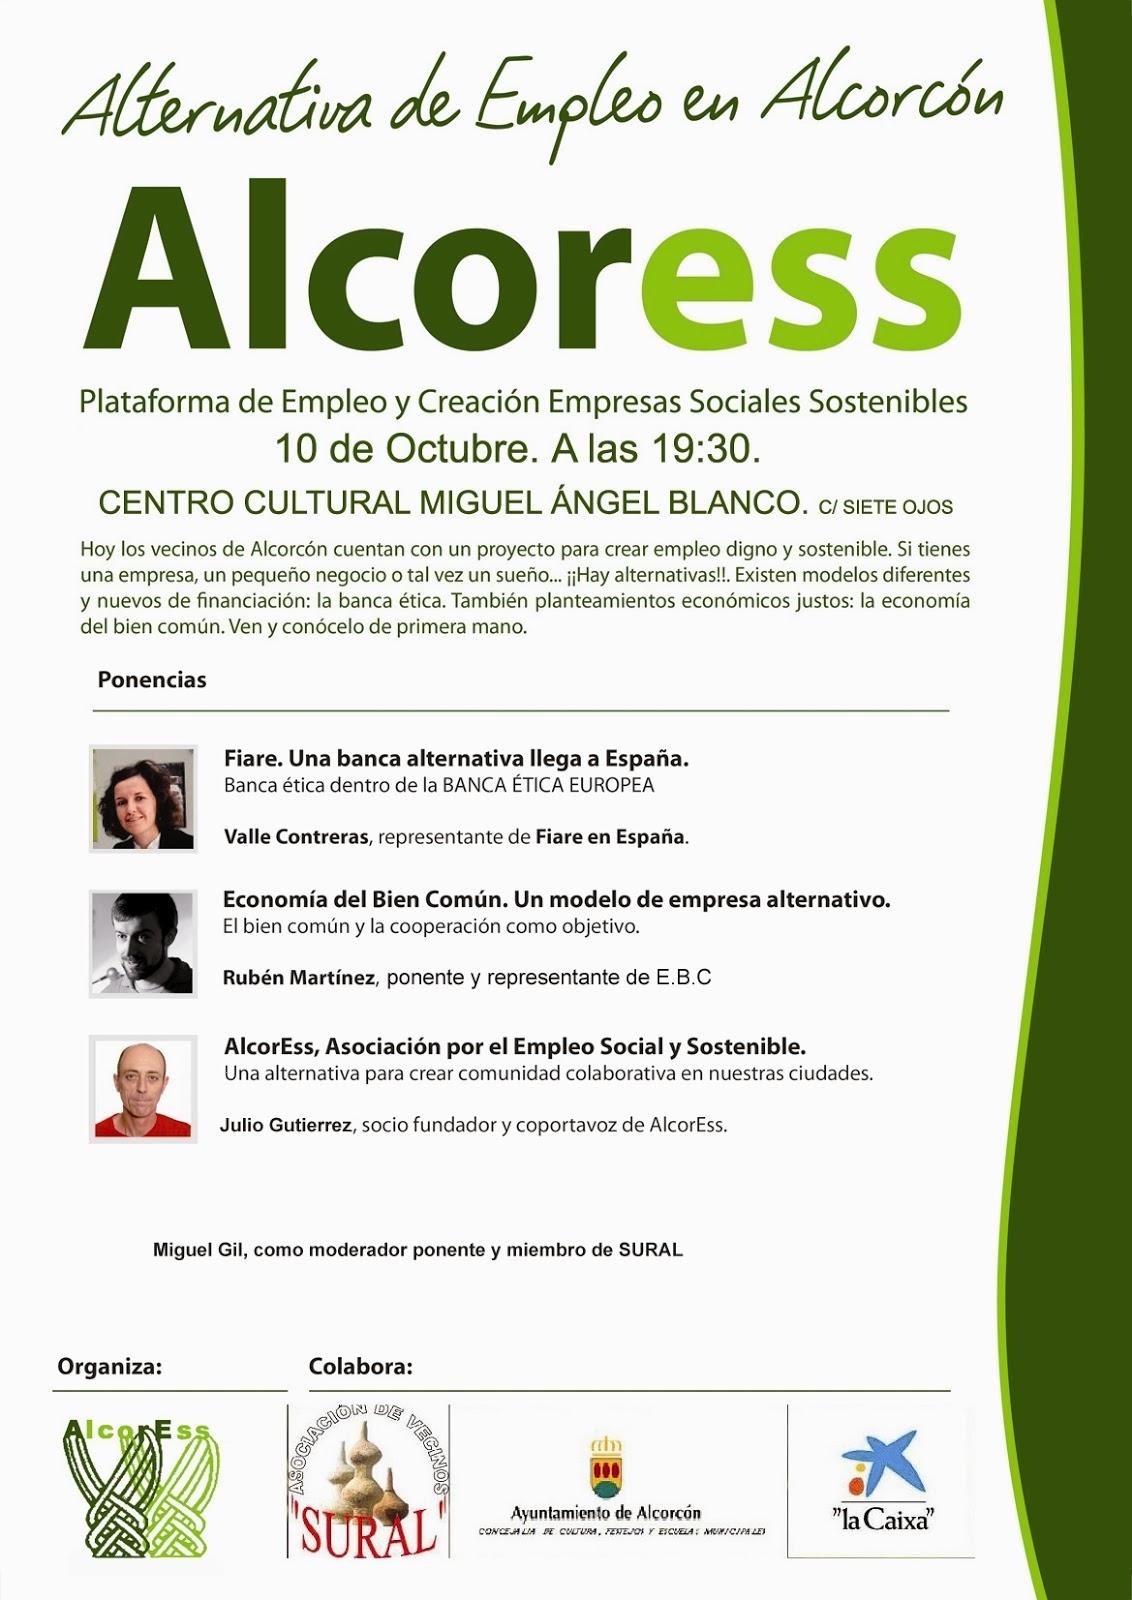 alcoress